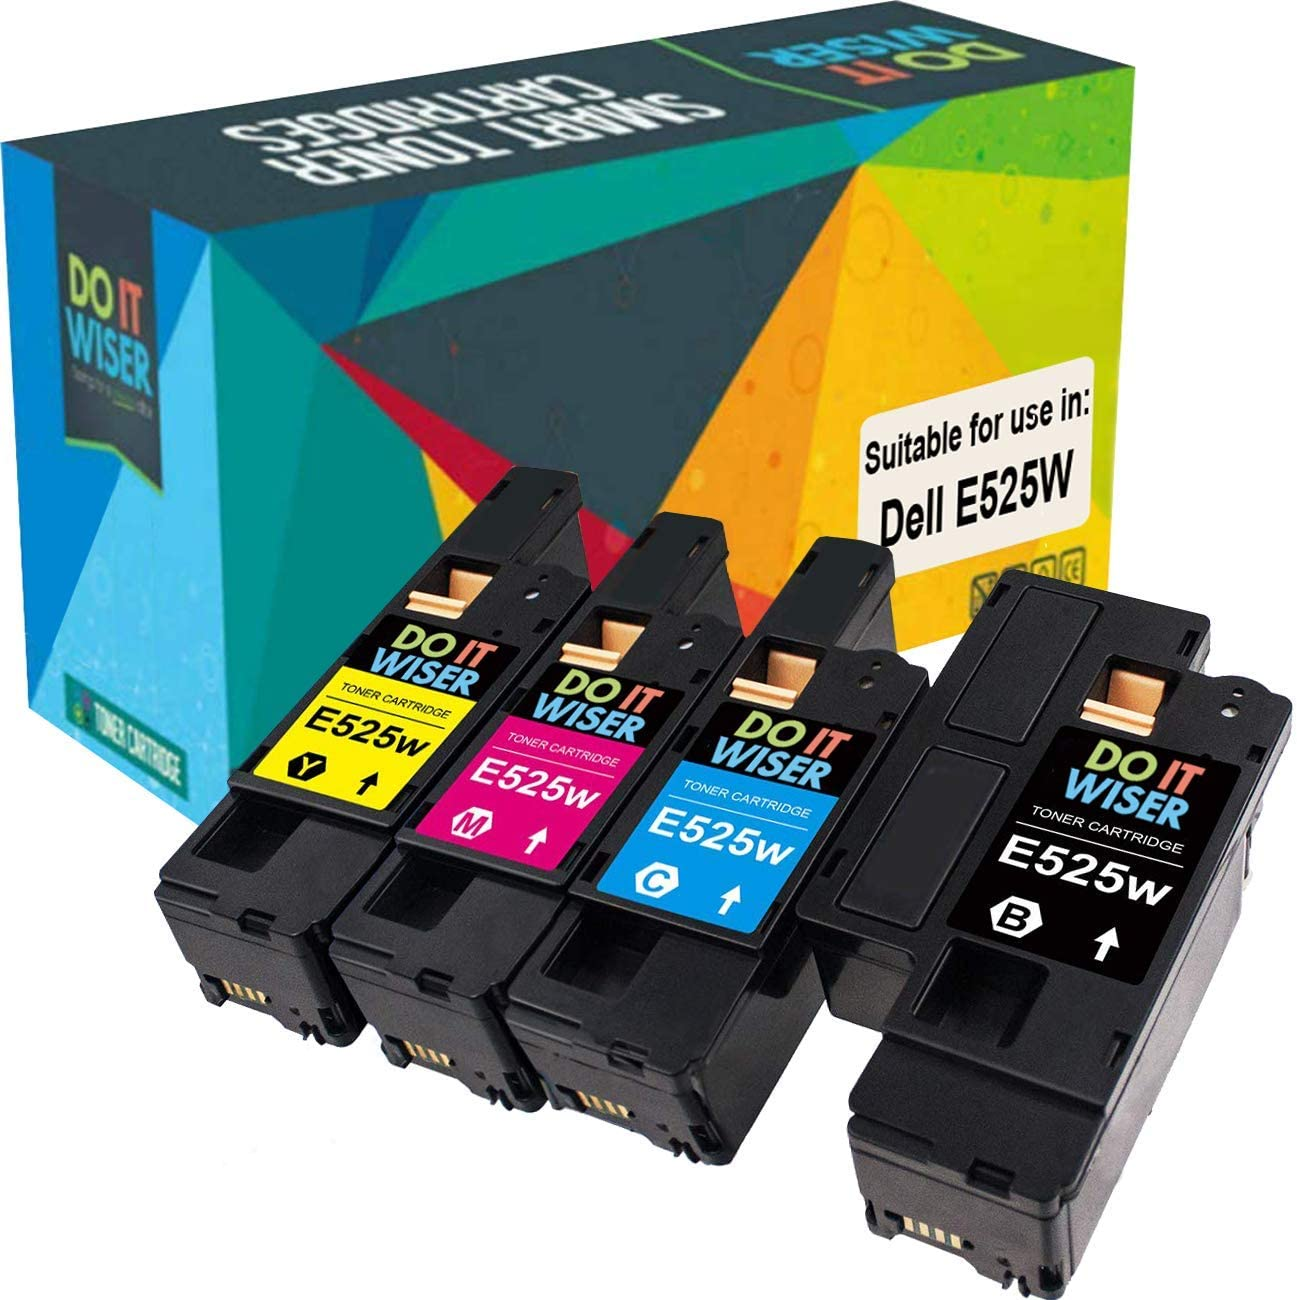 Do it Wiser Compatible Toner Cartridge Replacement for Dell E525W E525 525W | 593-BBJX, 593-BBJU, 593-BBJV 593-BBJW (Black, Cyan, Magenta, Yellow) 4 Pack